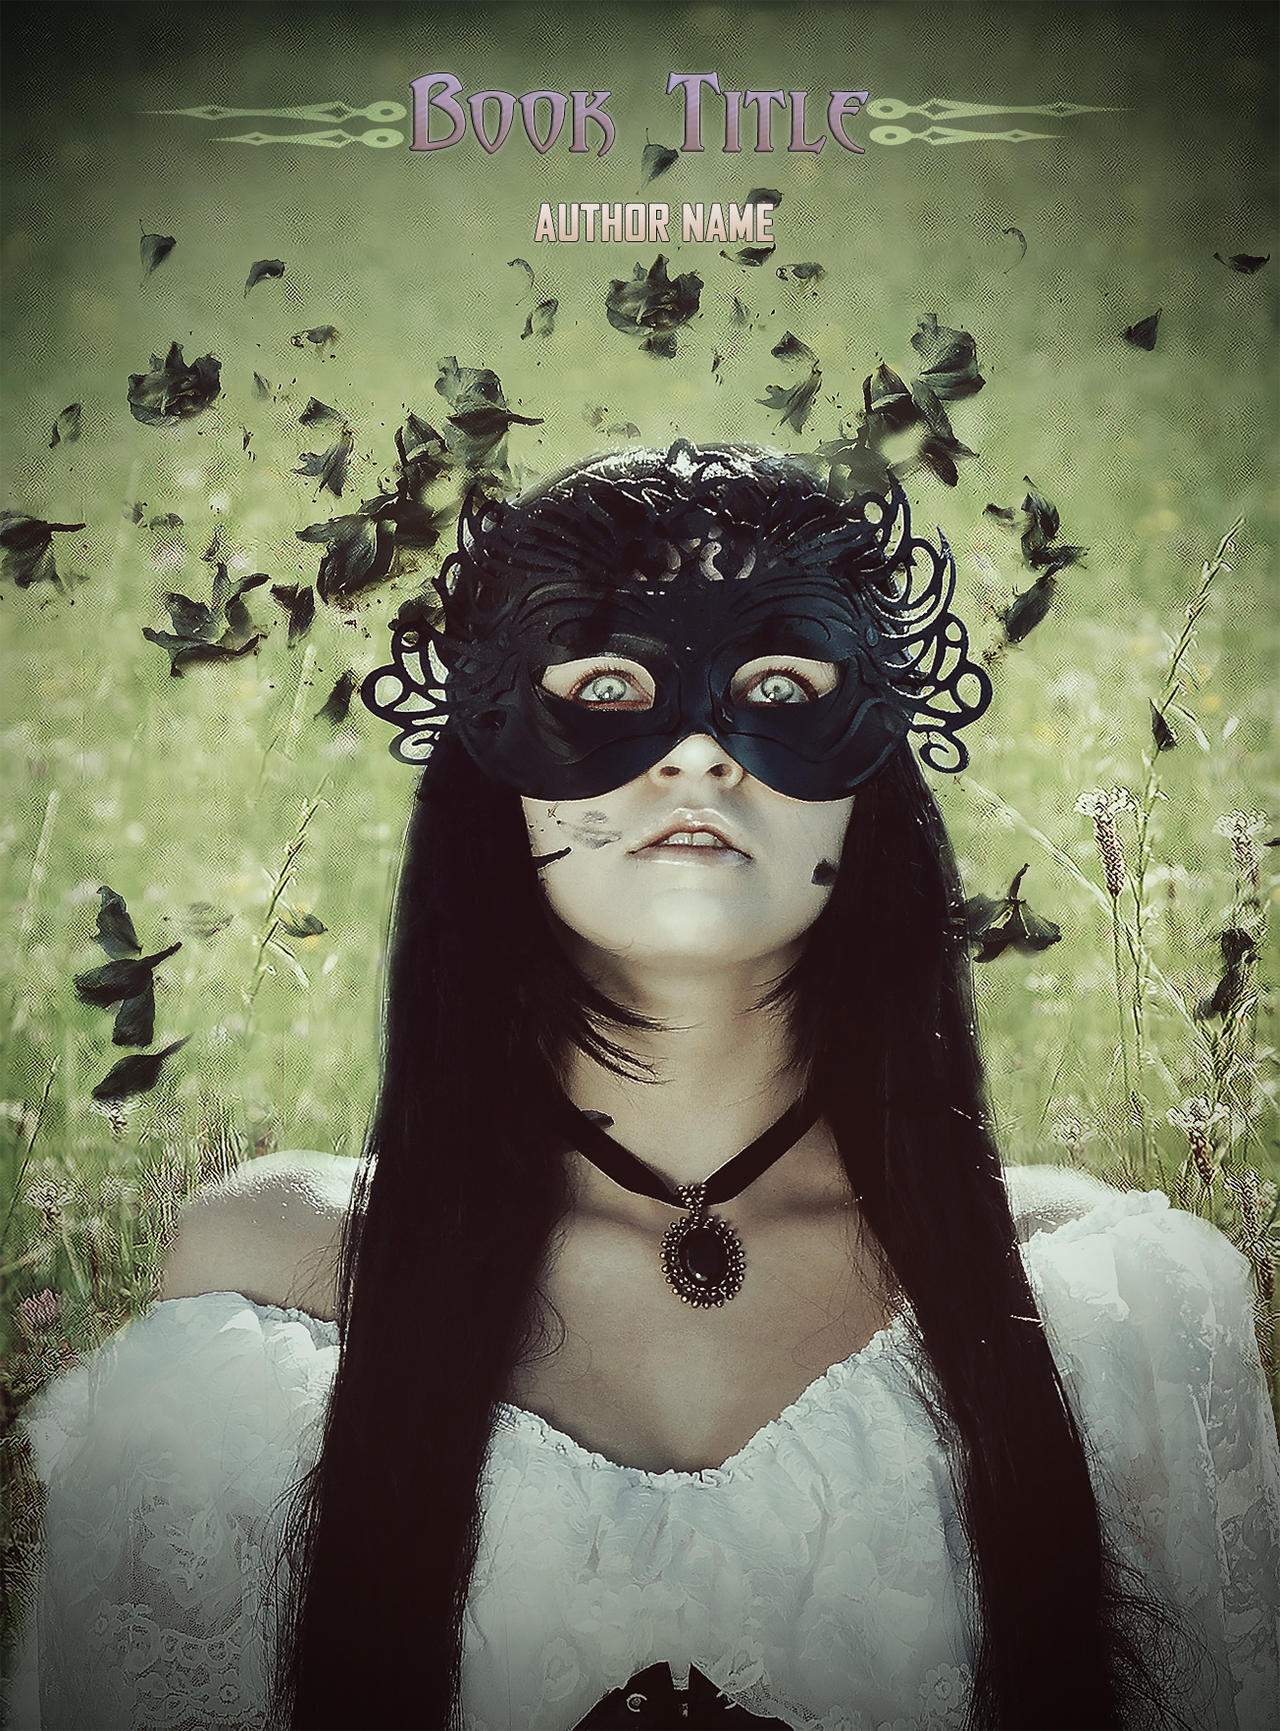 [Imagen: dark_book_cover_by_gurlindashadows-d8y5zcf.jpg]